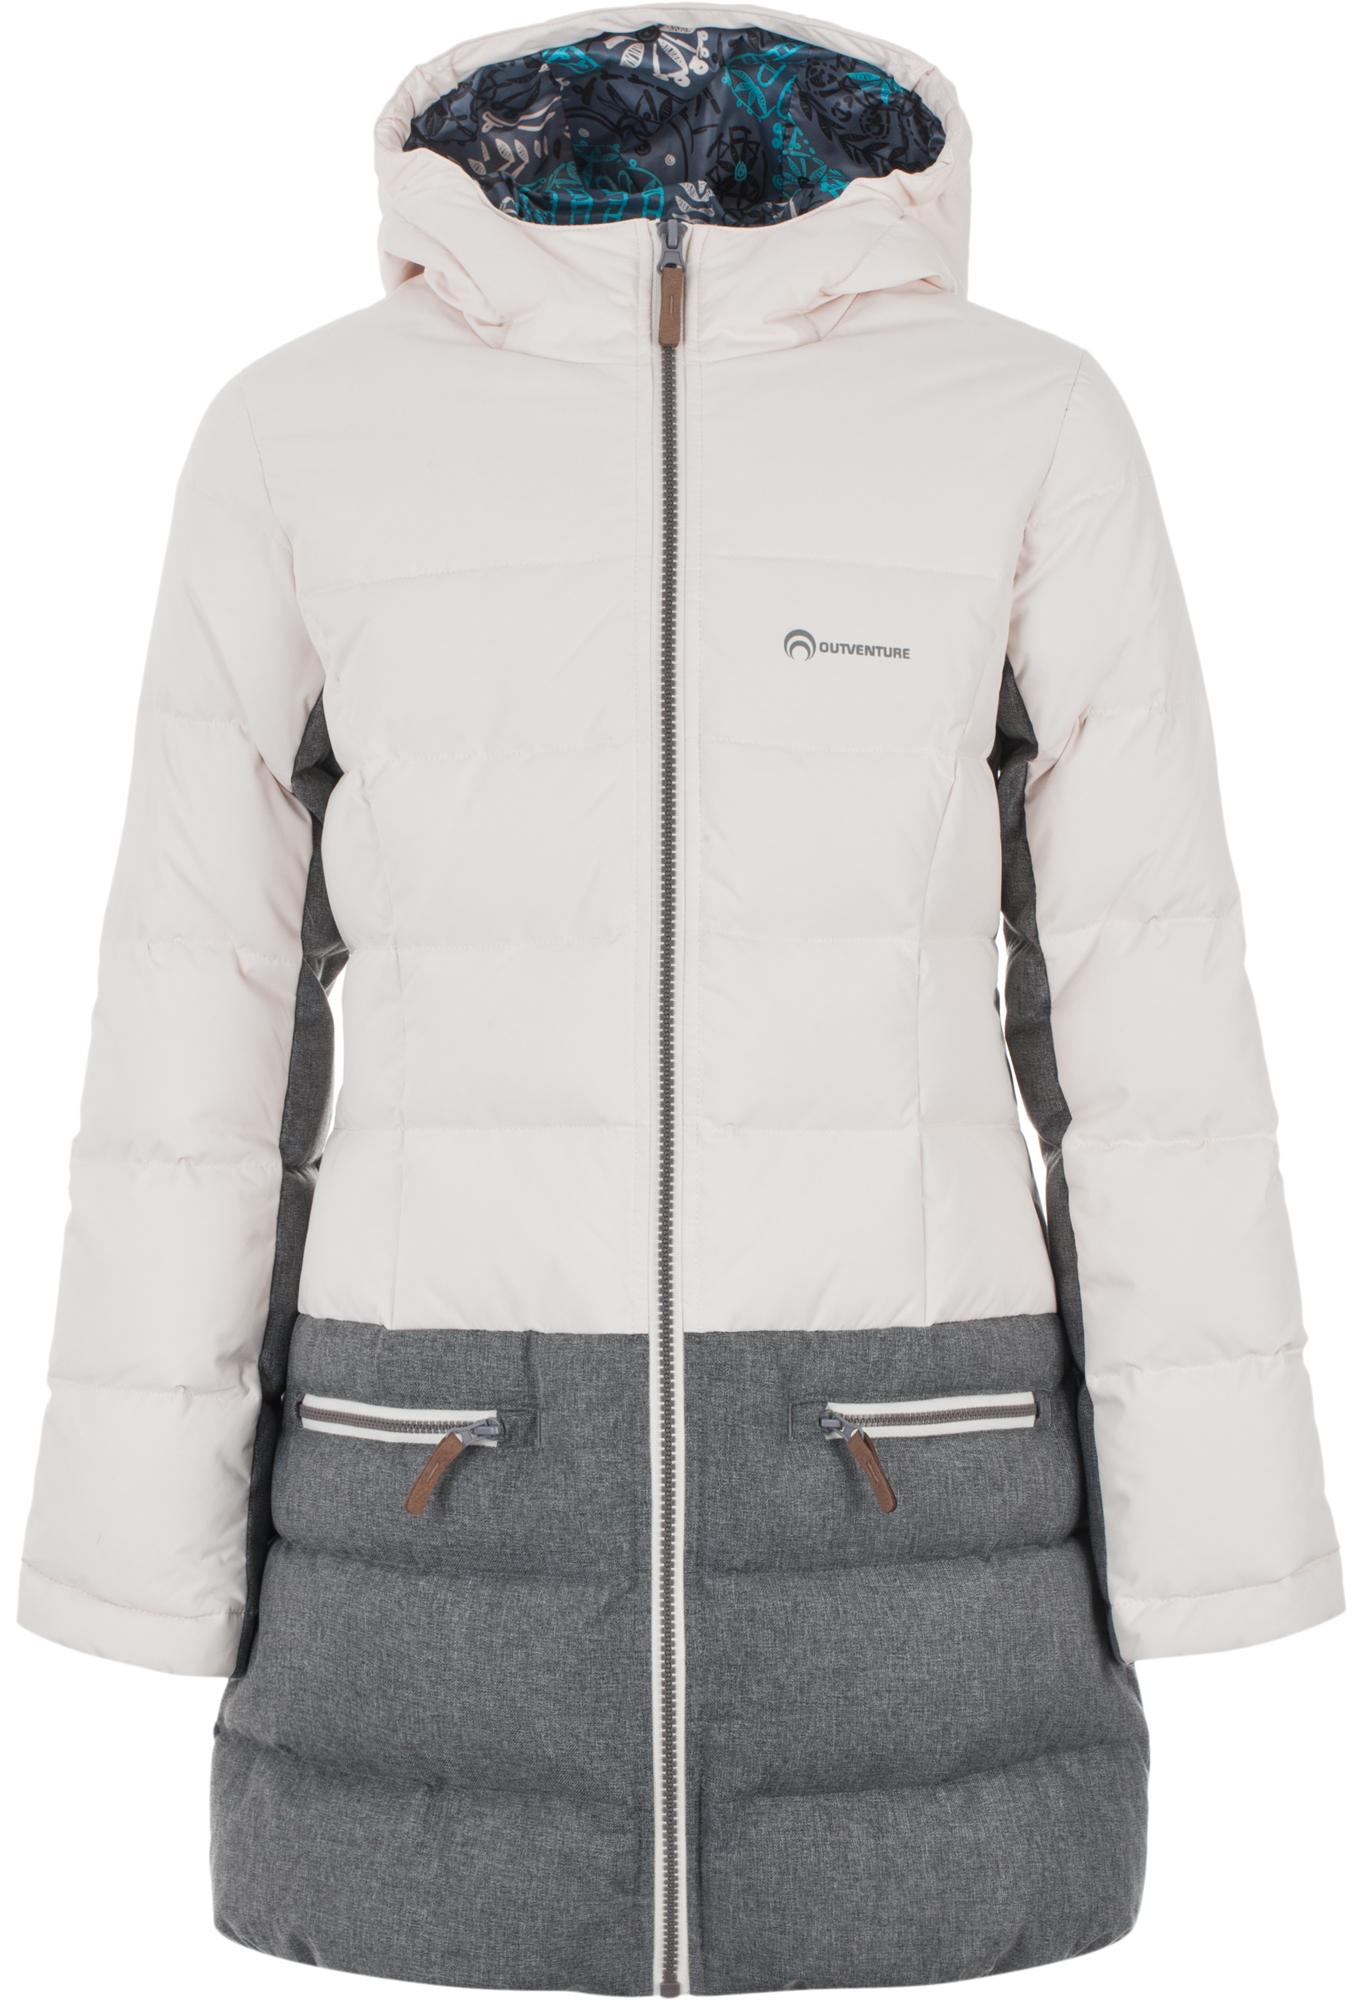 Outventure Куртка пуховая для девочек Outventure, размер 164